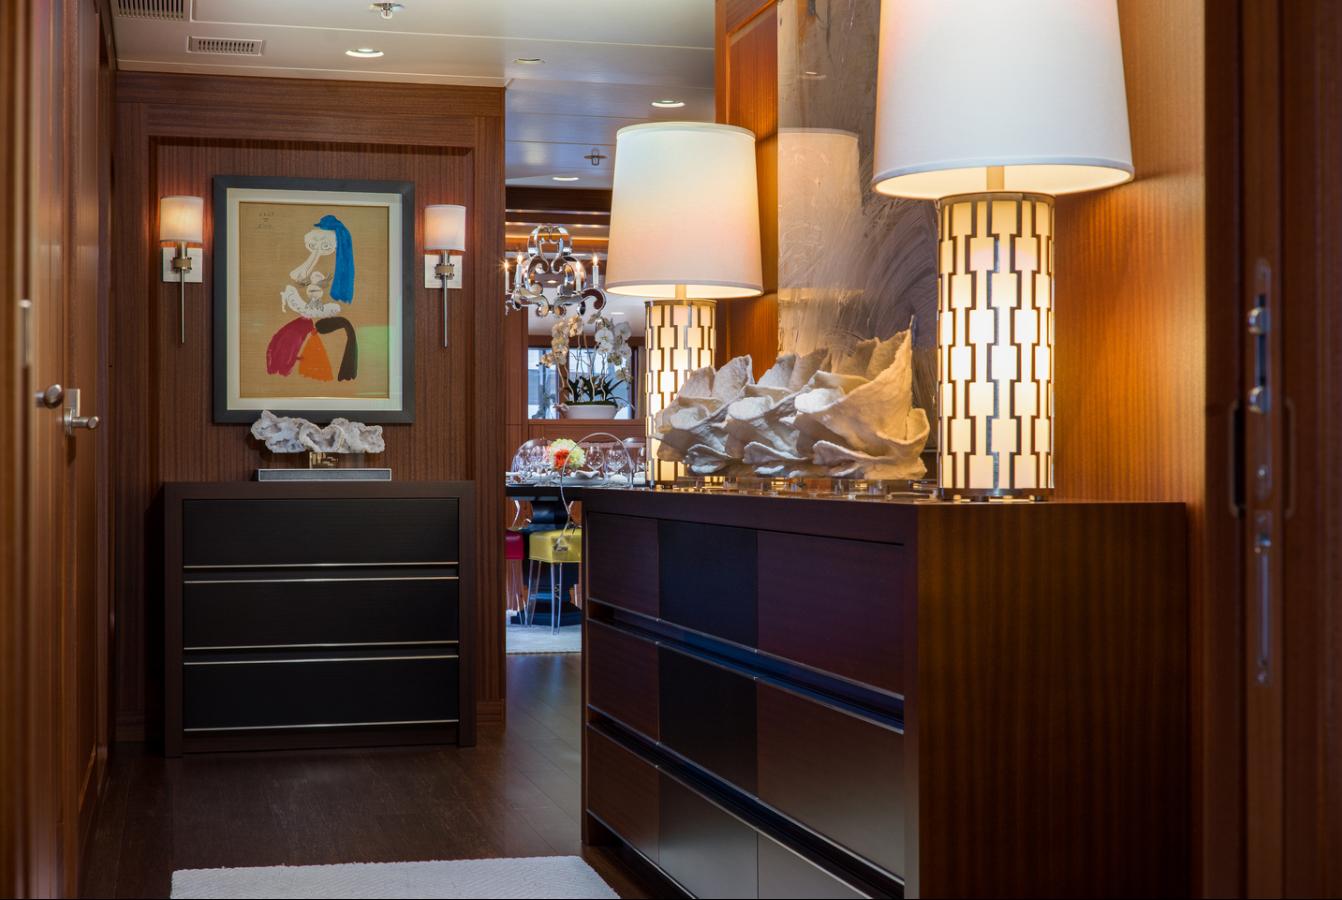 Kyoto Table Lamp_Topanga I ADA Sconce_Boyd Lighting_Varo Interior Design_Cavan Hadley